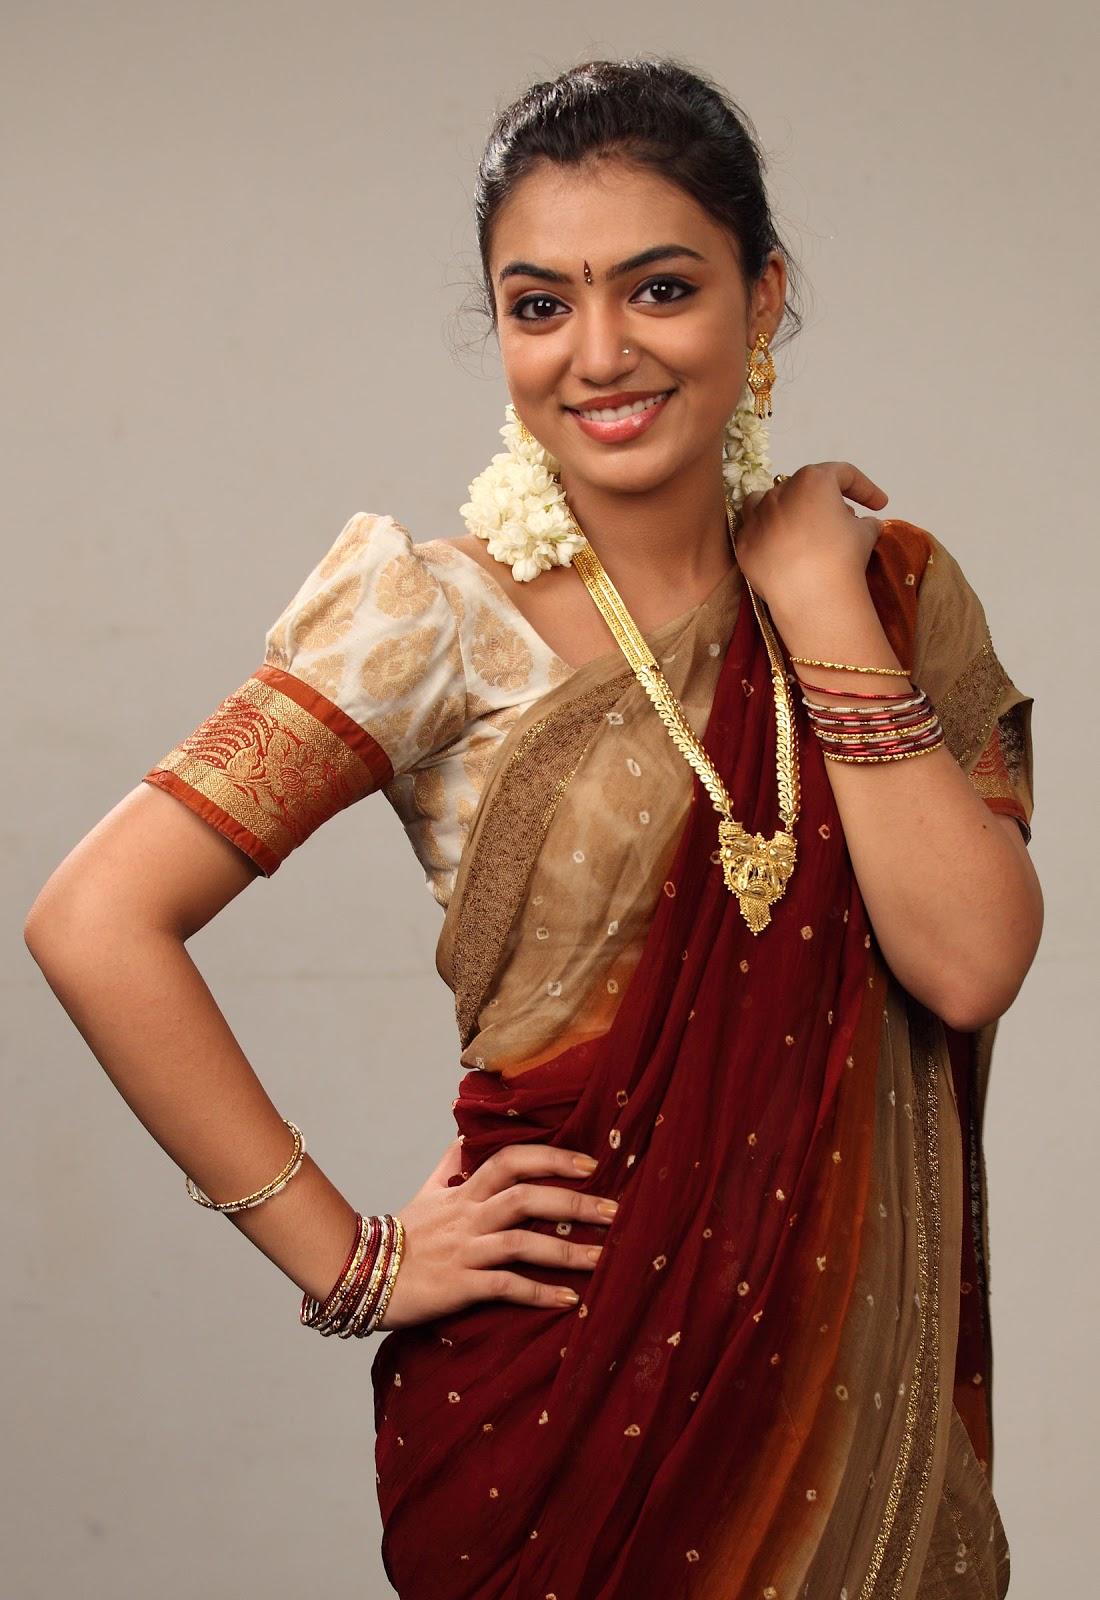 mallu actress nazriya nazim cute in saree 171 mallufuncom